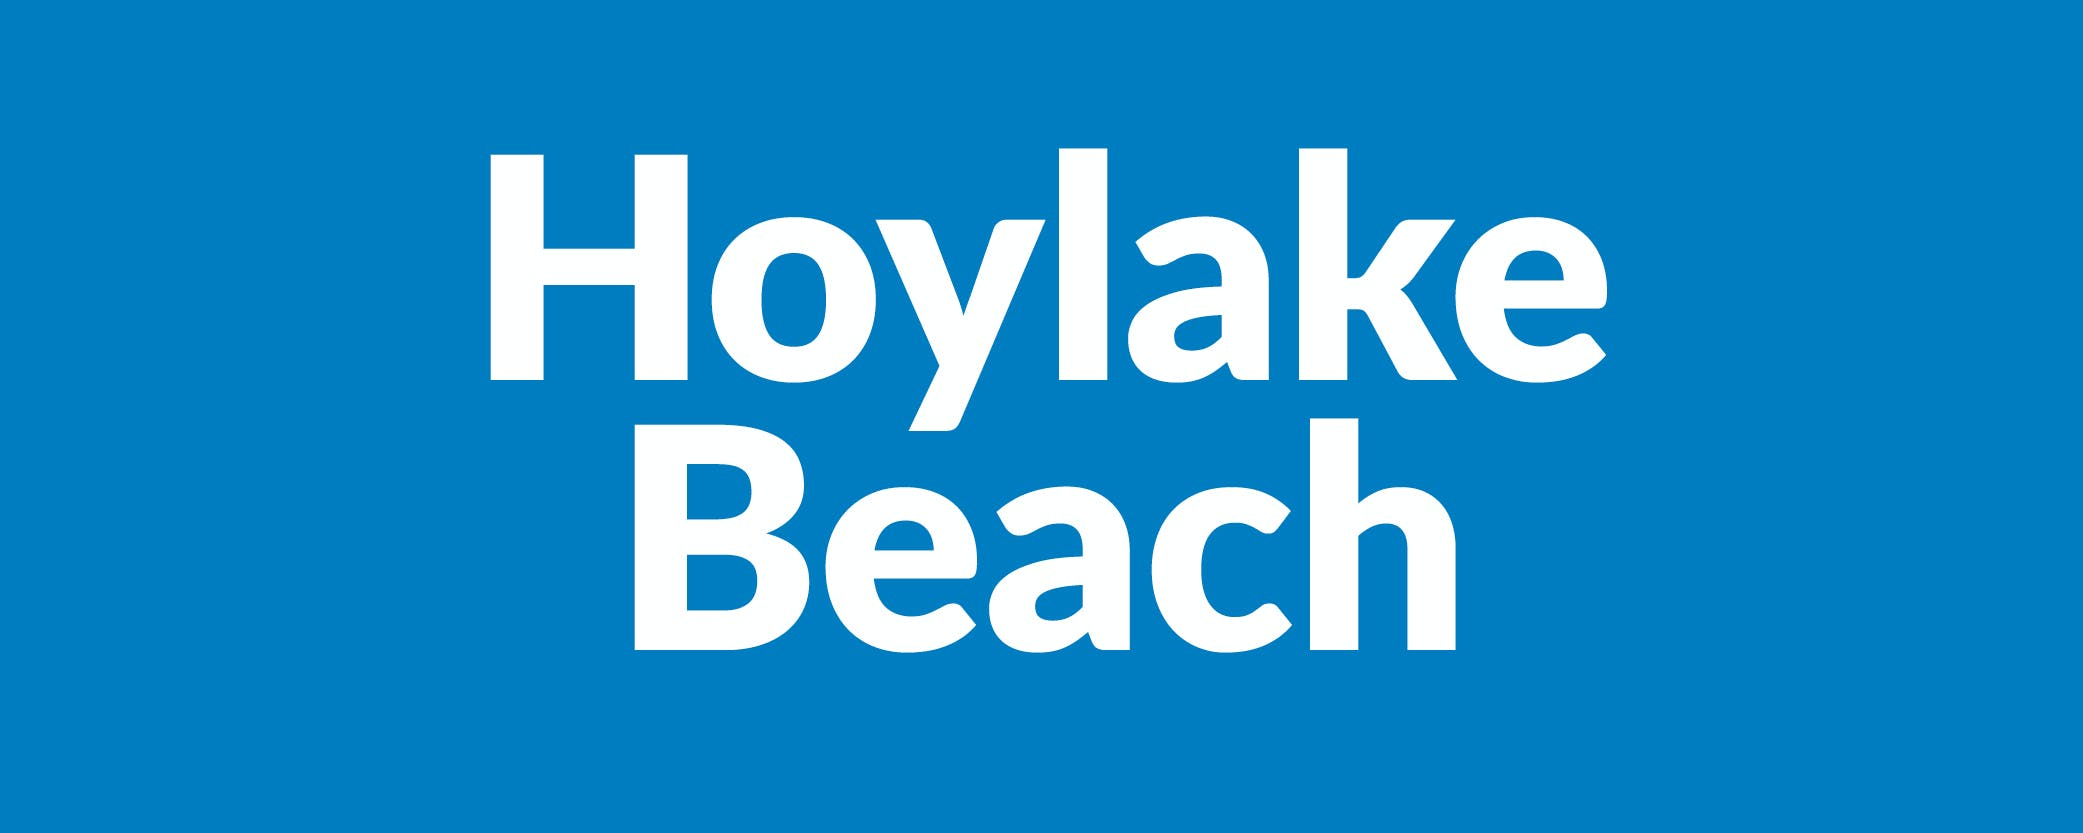 Hoylake Beach text